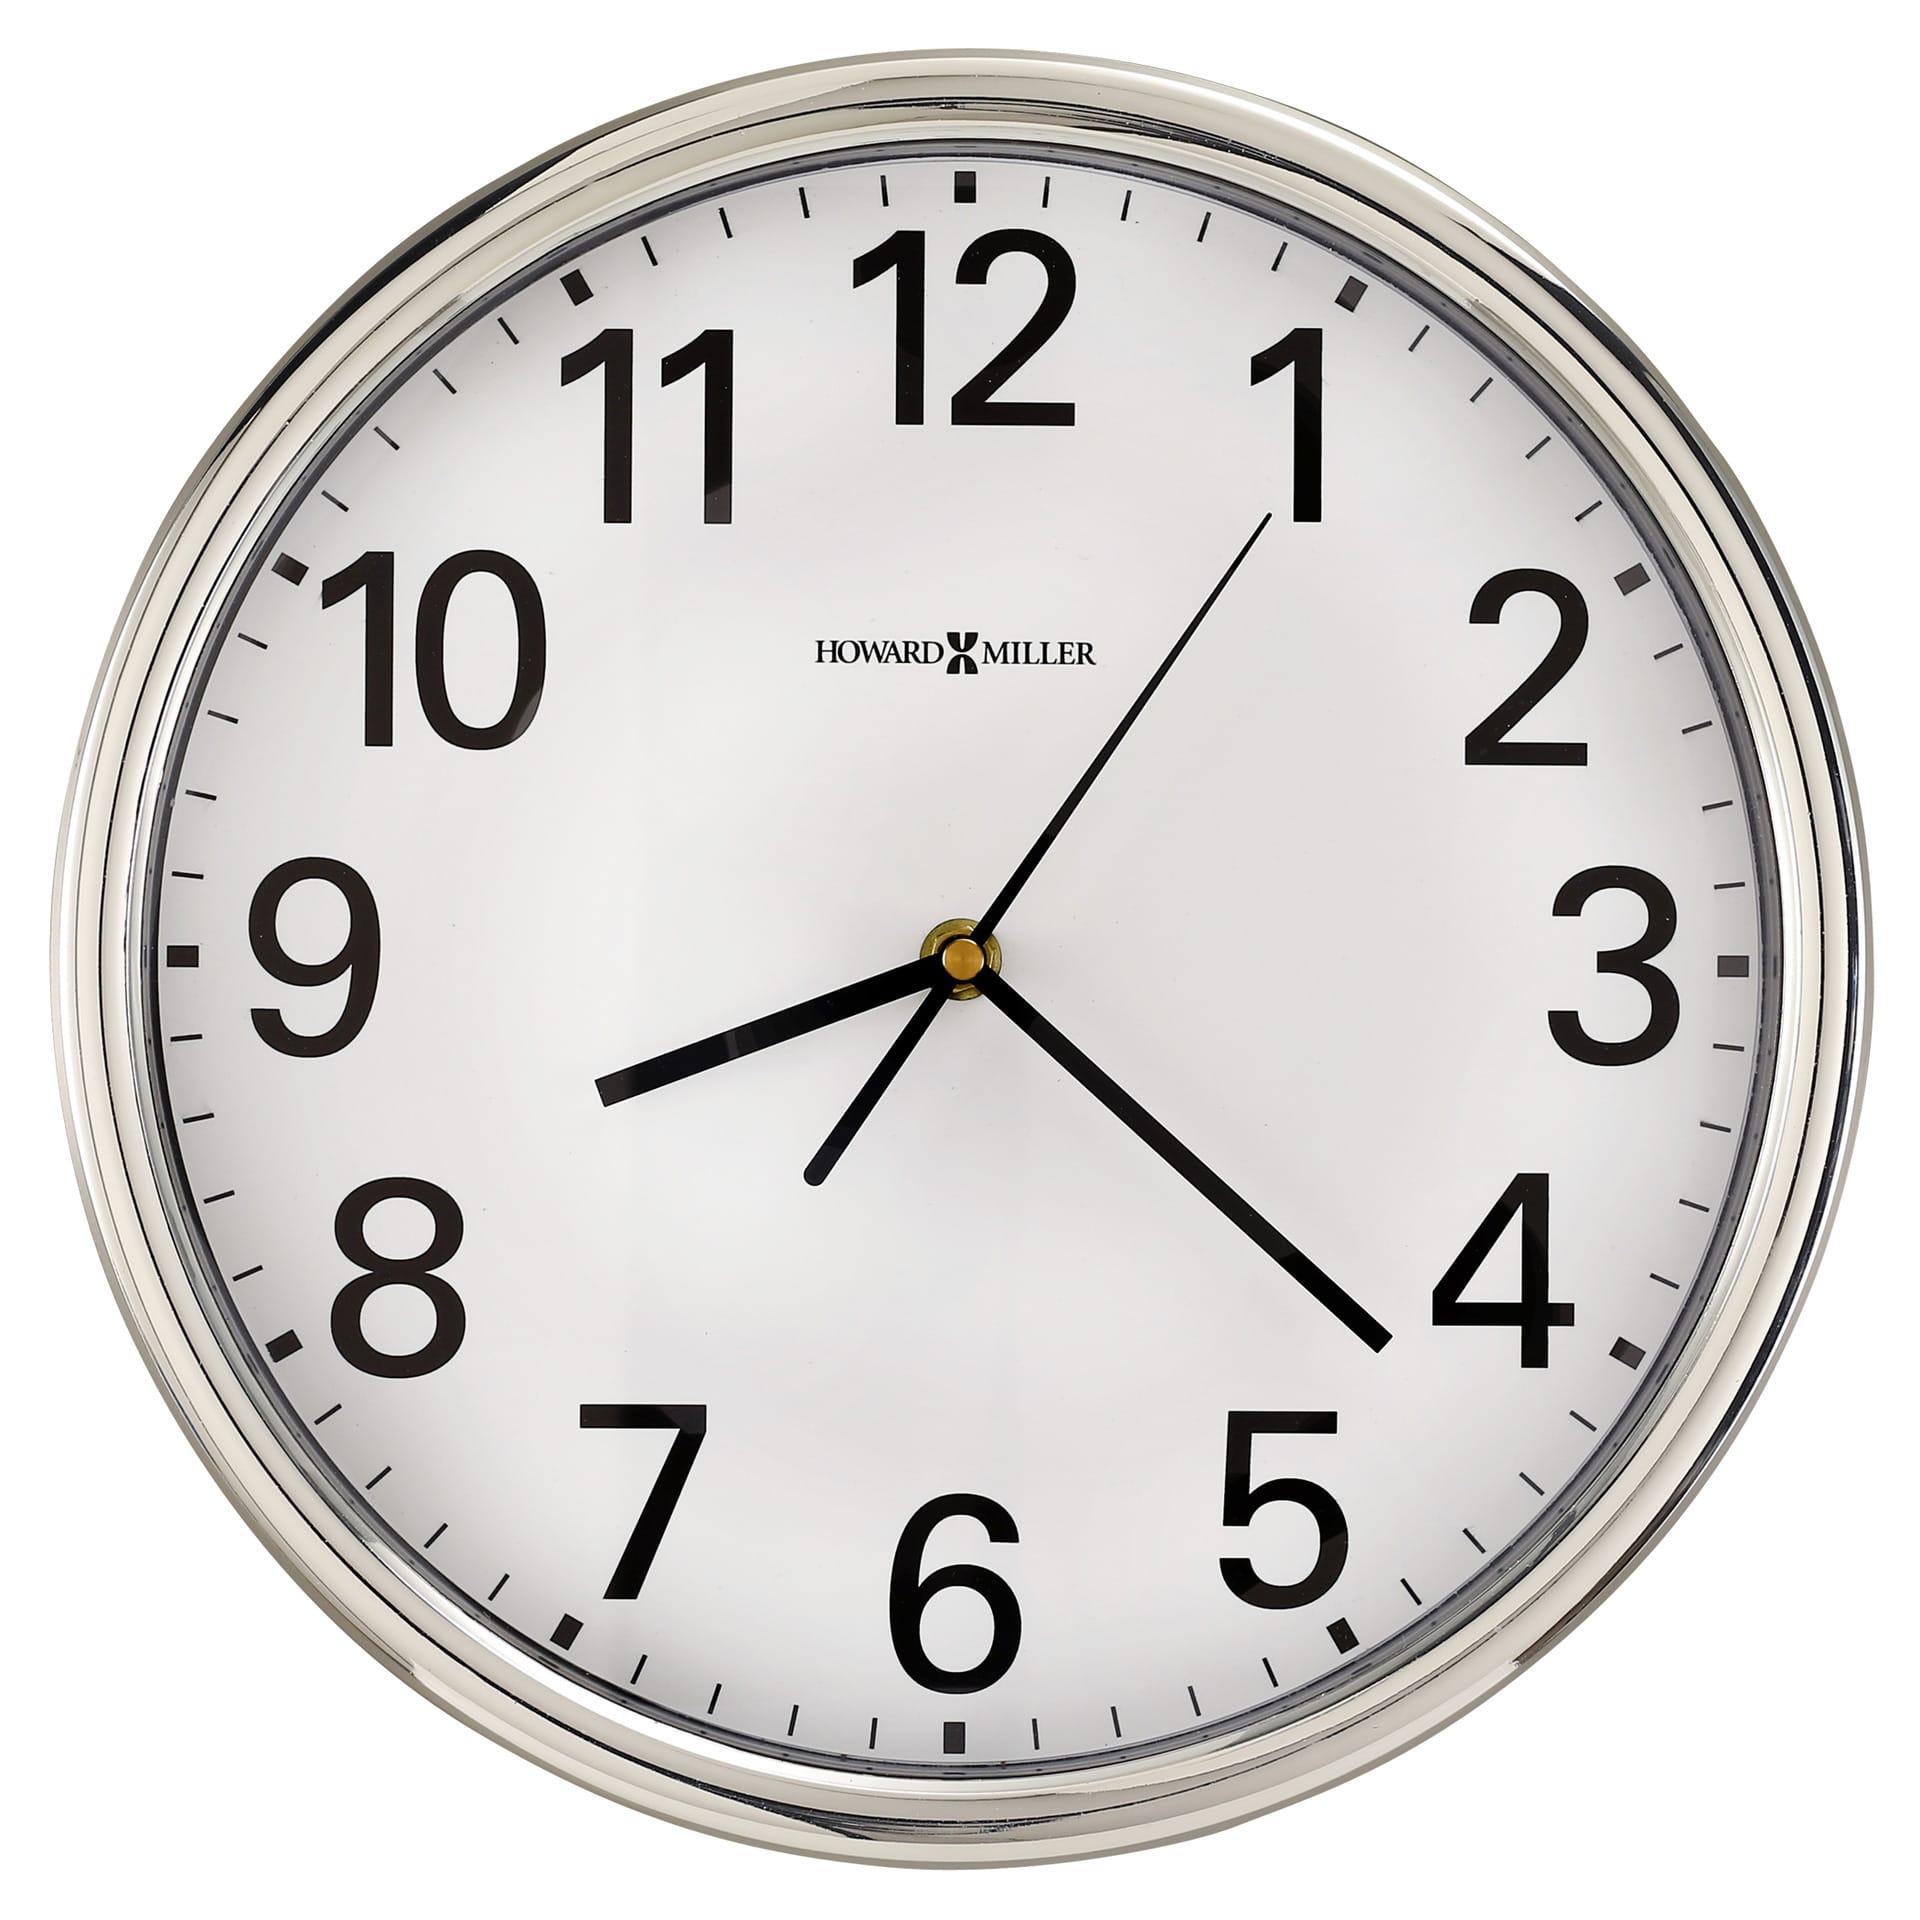 625 561 Hamilton Wall Clock By Howard Miller